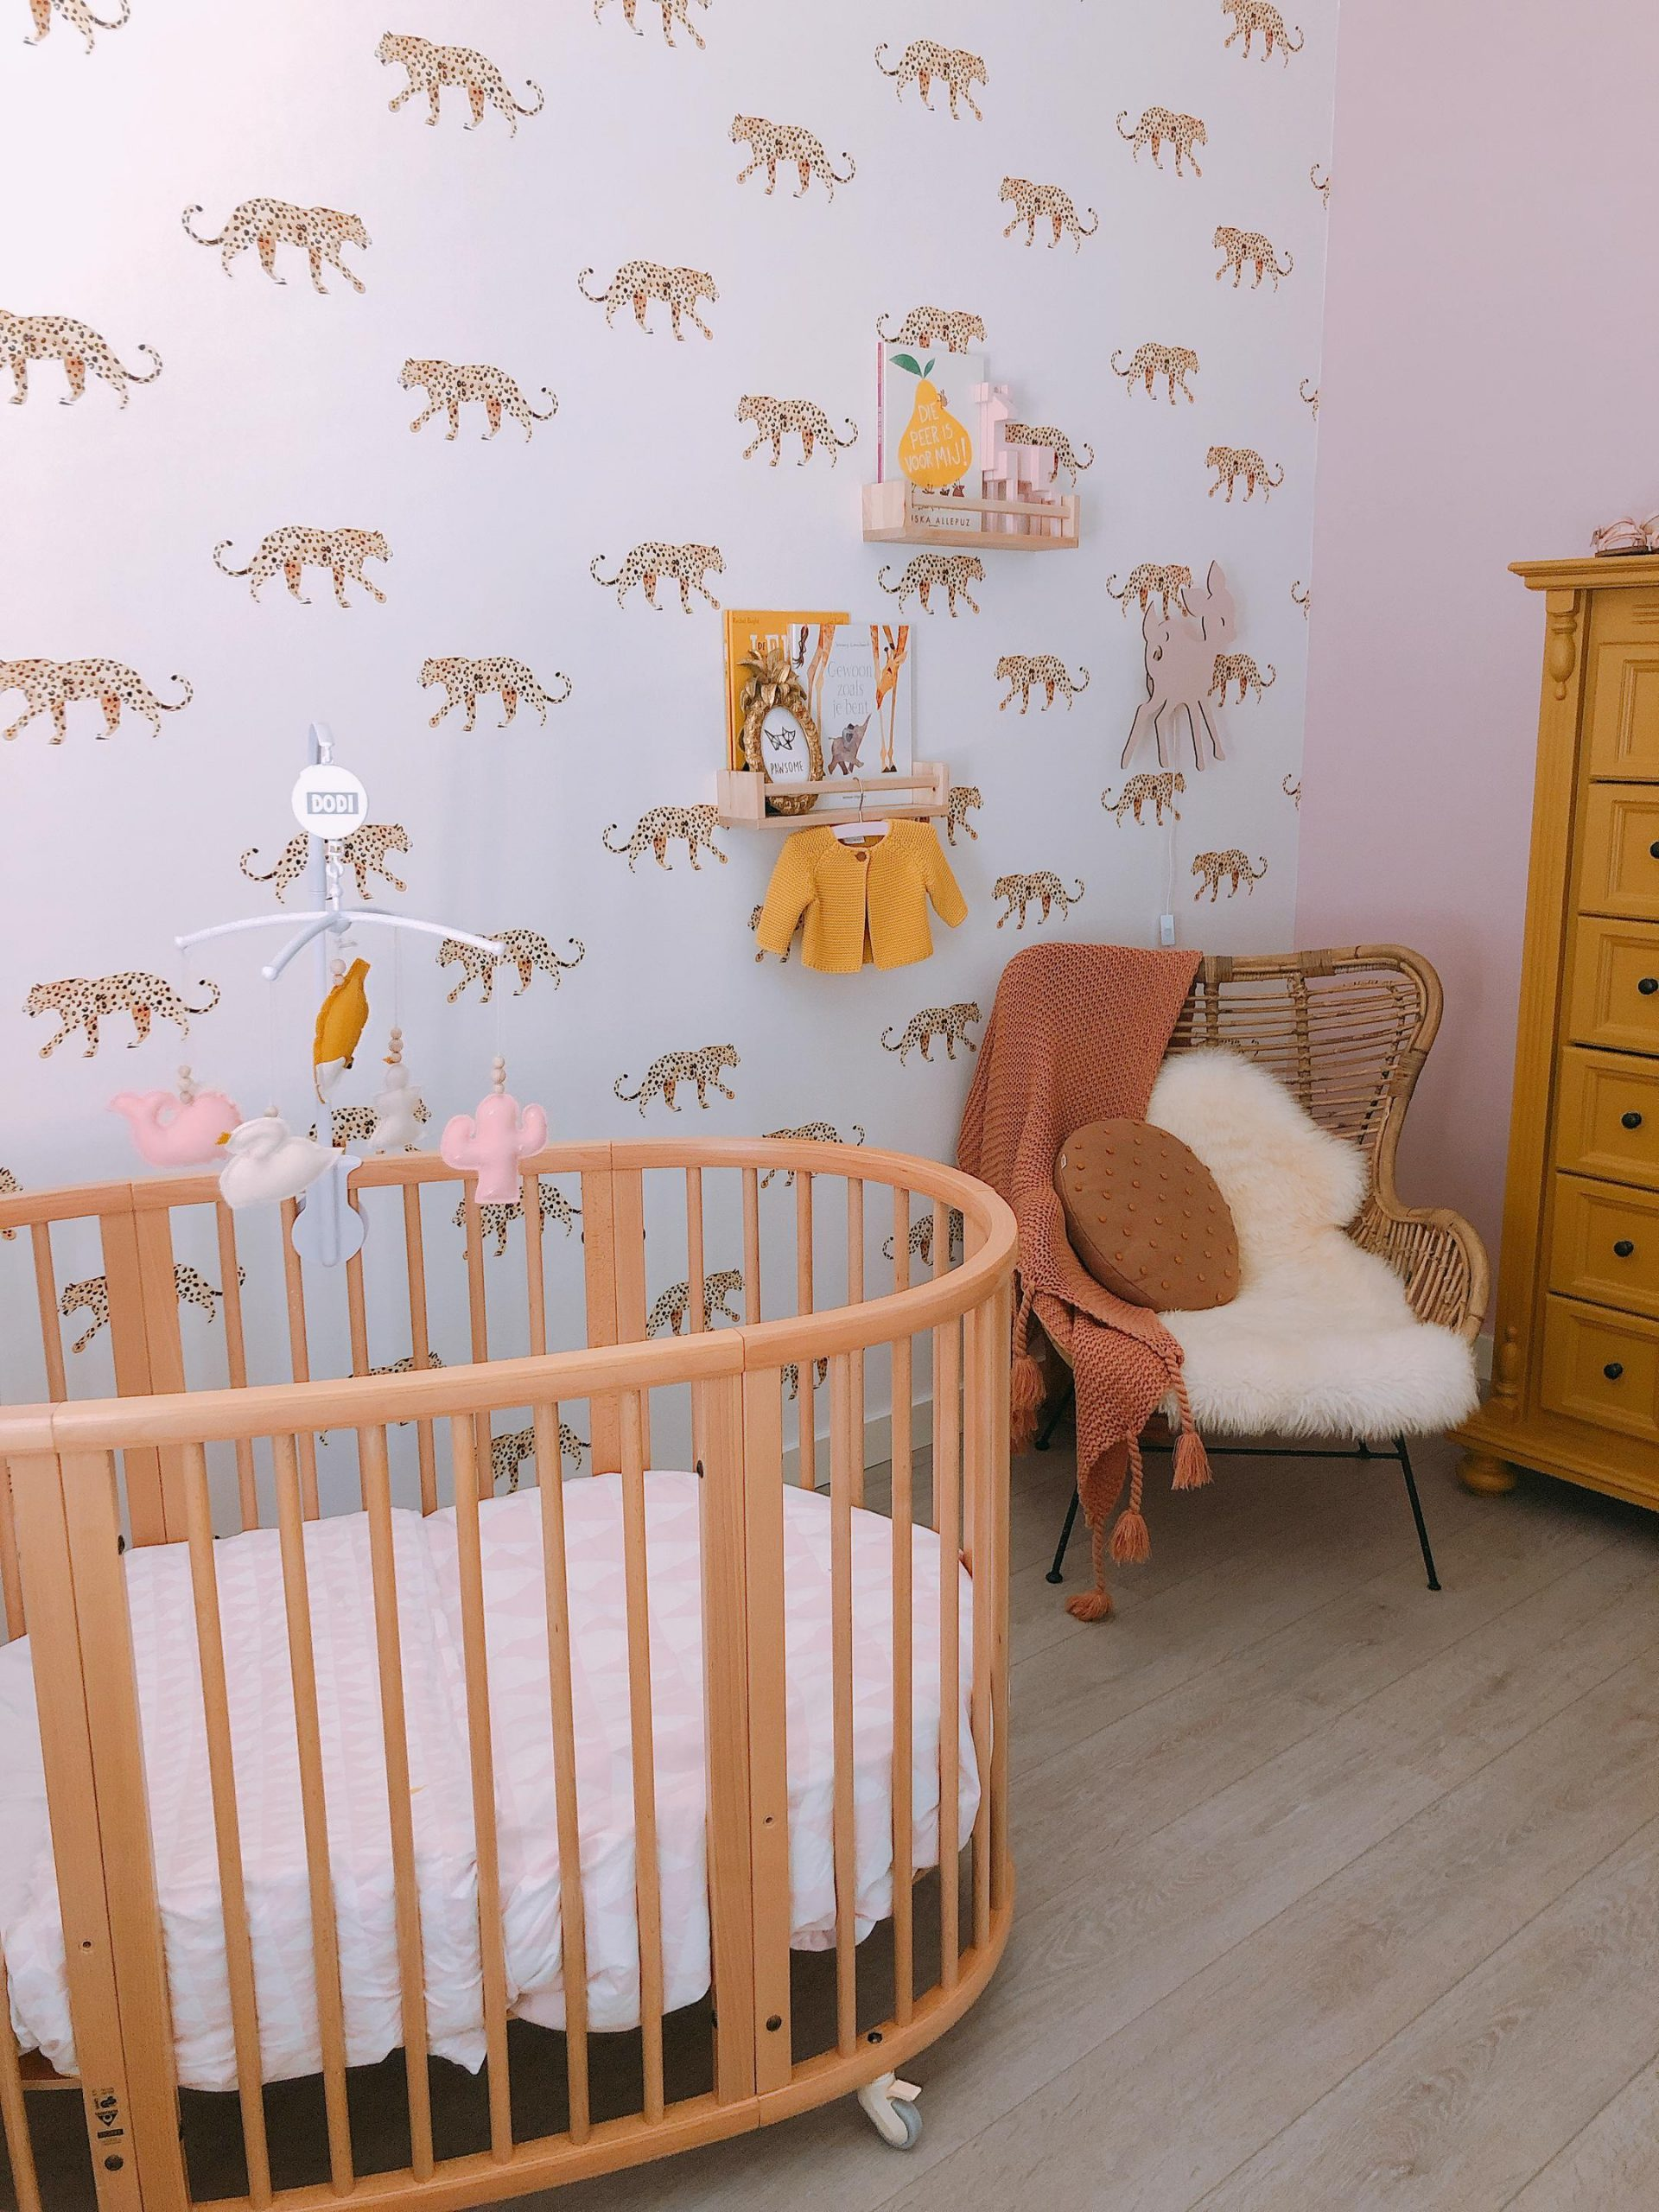 IMG 6975 2160x2880 1 scaled - De baby/kinderkamer van Hazel - roze, hout & marmer!